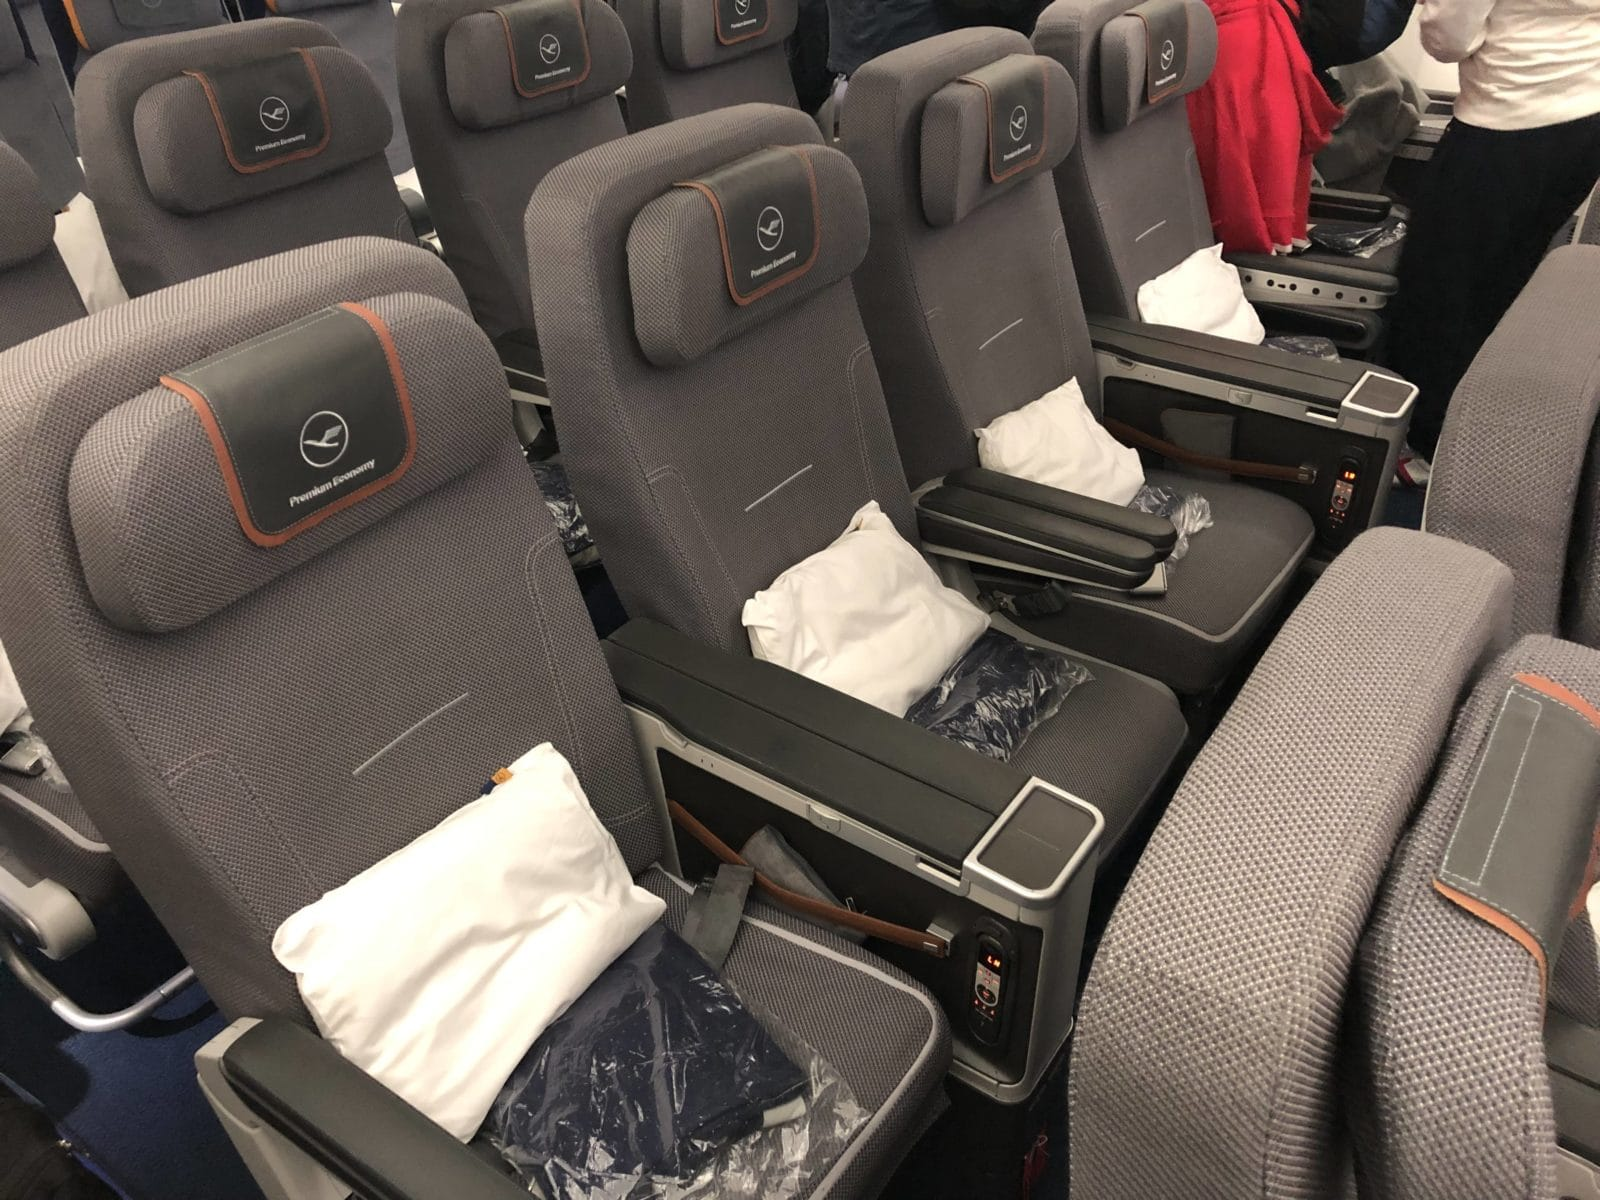 Lufthansa Premium Economy mittlere Reihe